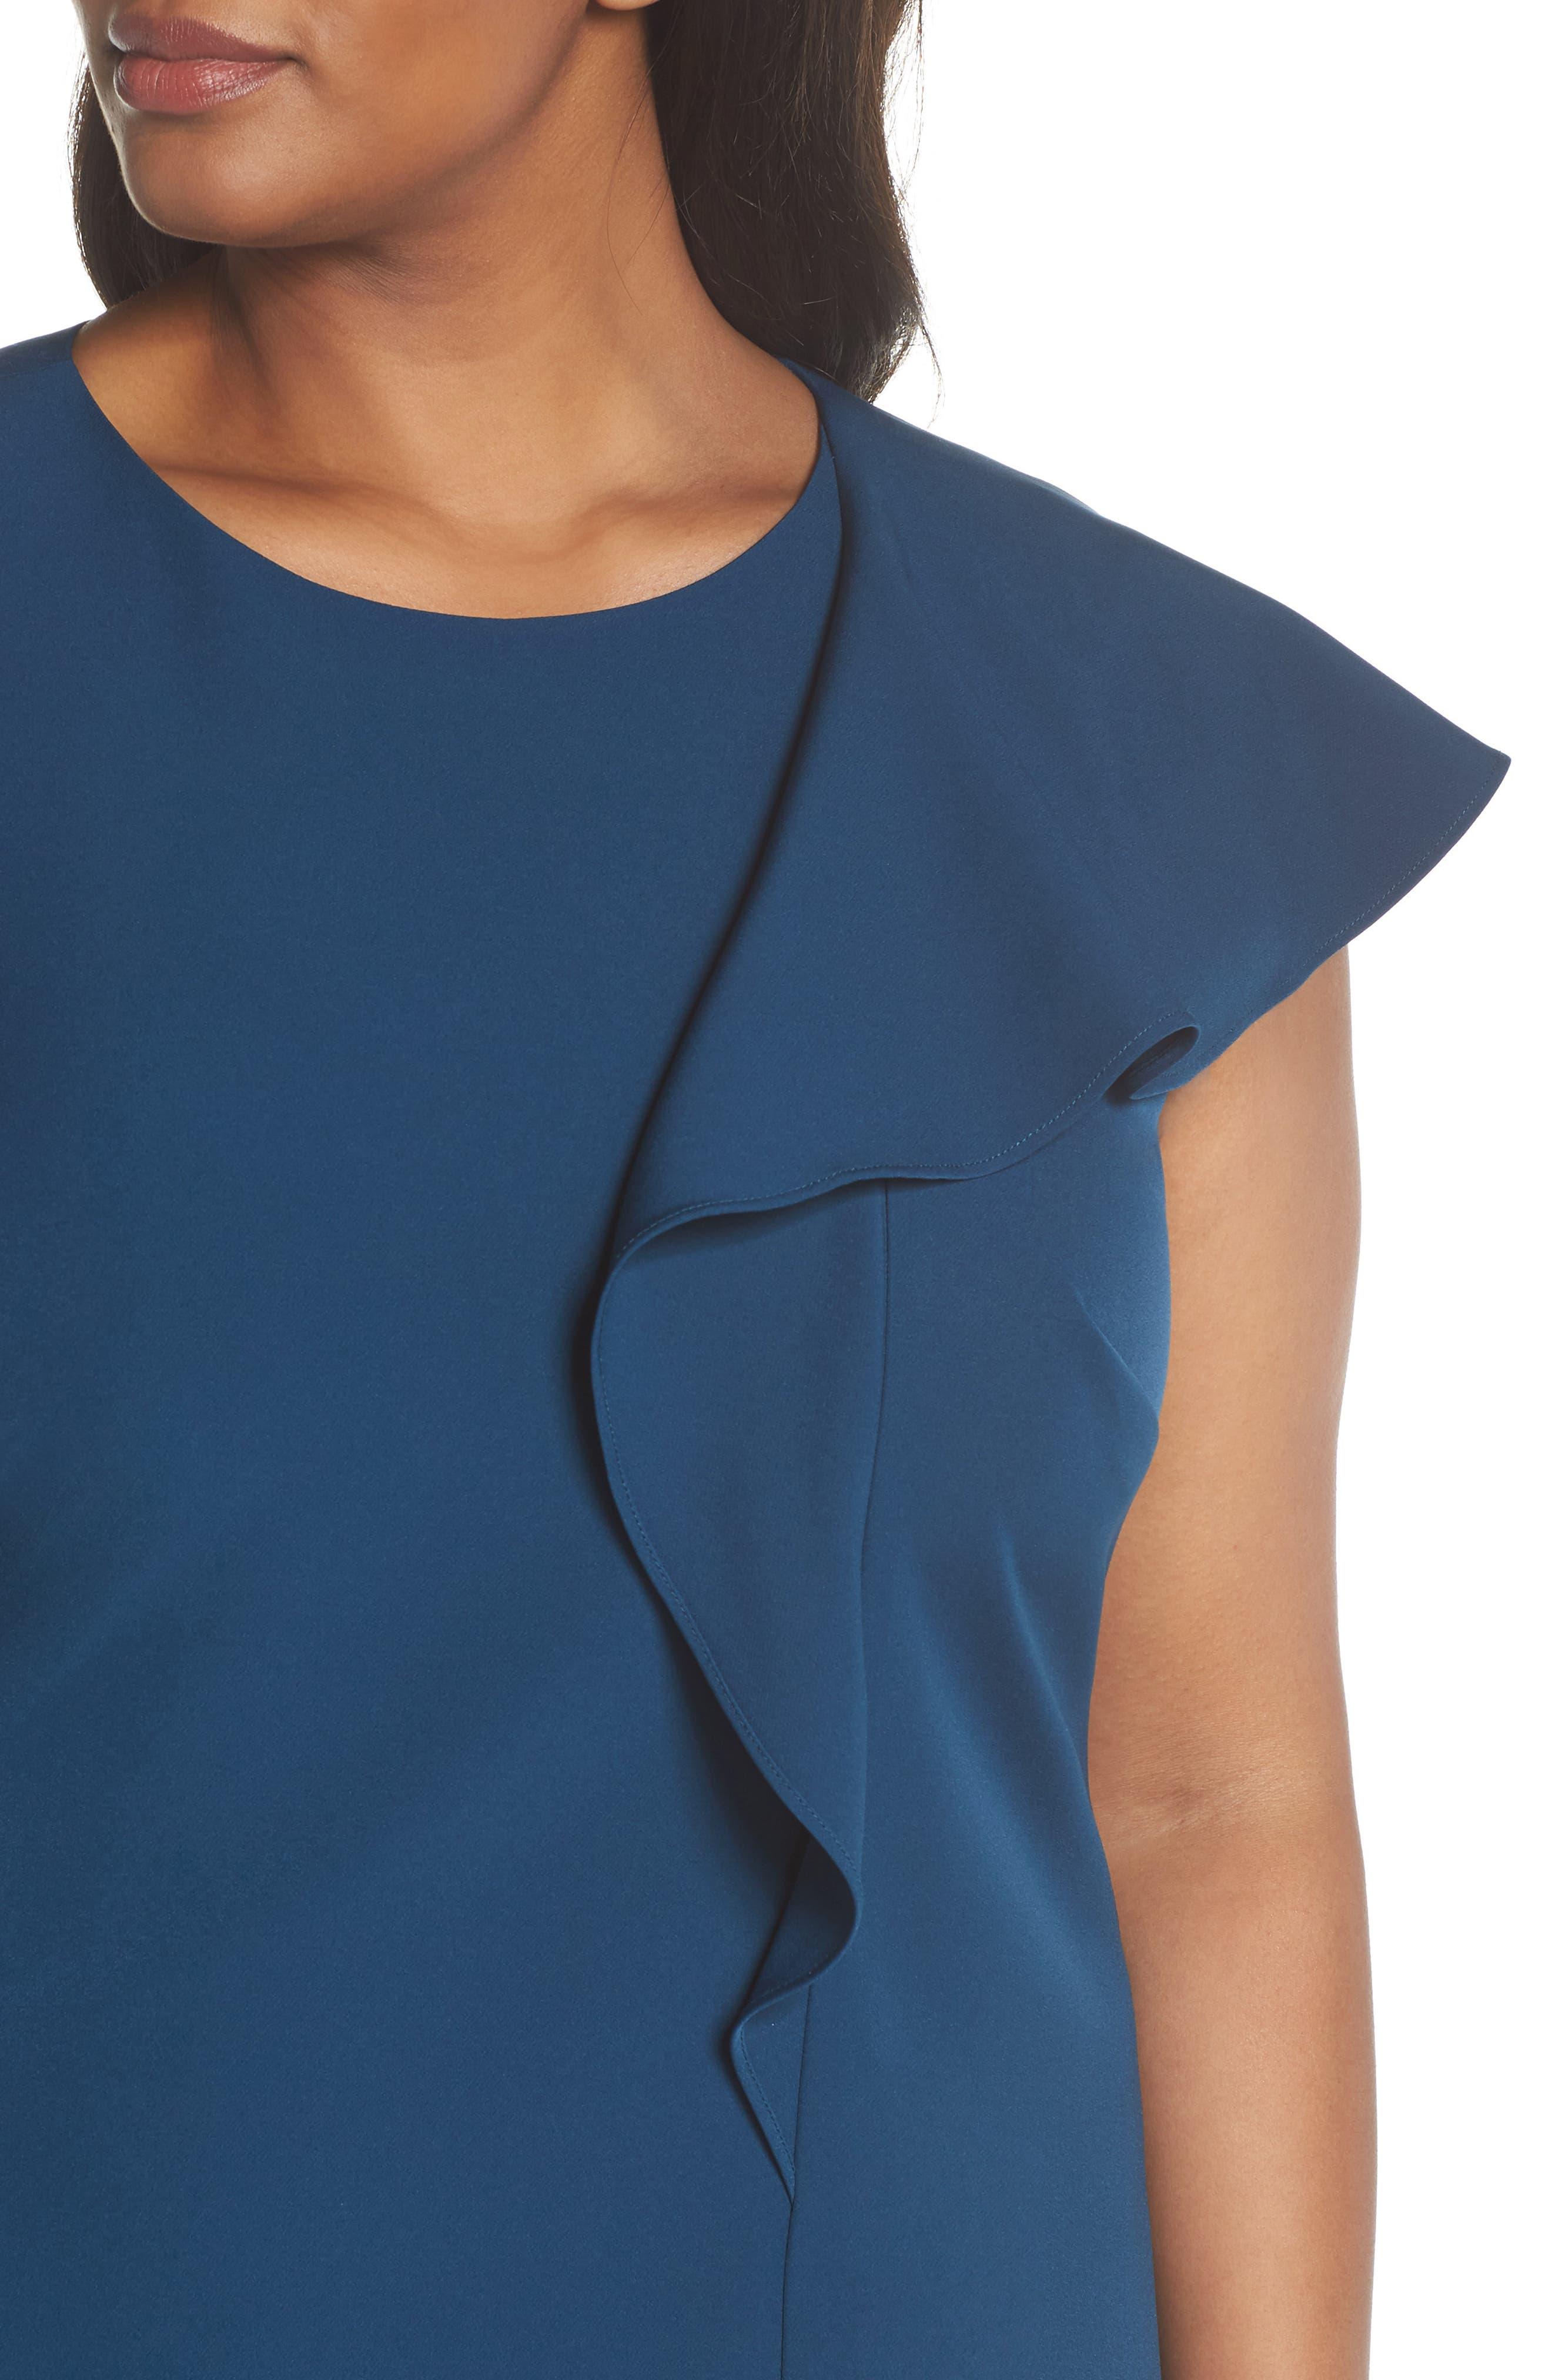 Ruffle Crepe A-Line Dress,                             Alternate thumbnail 4, color,                             400